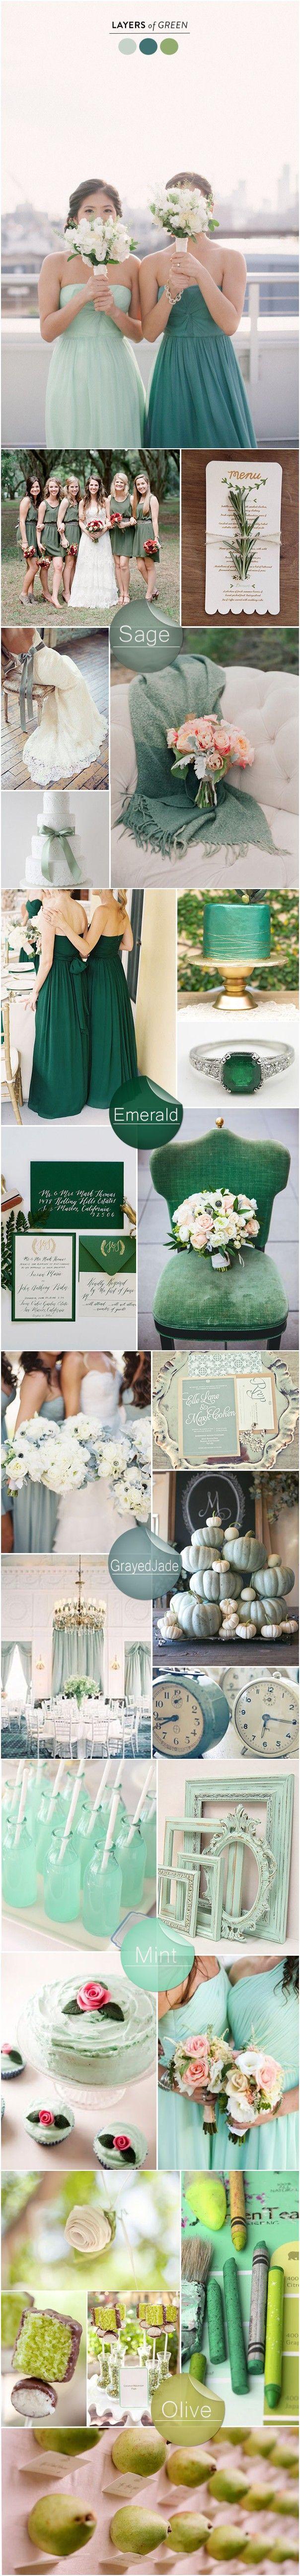 Perfect Shades of Green Wedding Color Ideas 2015 Trends - Sage Green, greened jade wedding color, wedding idea